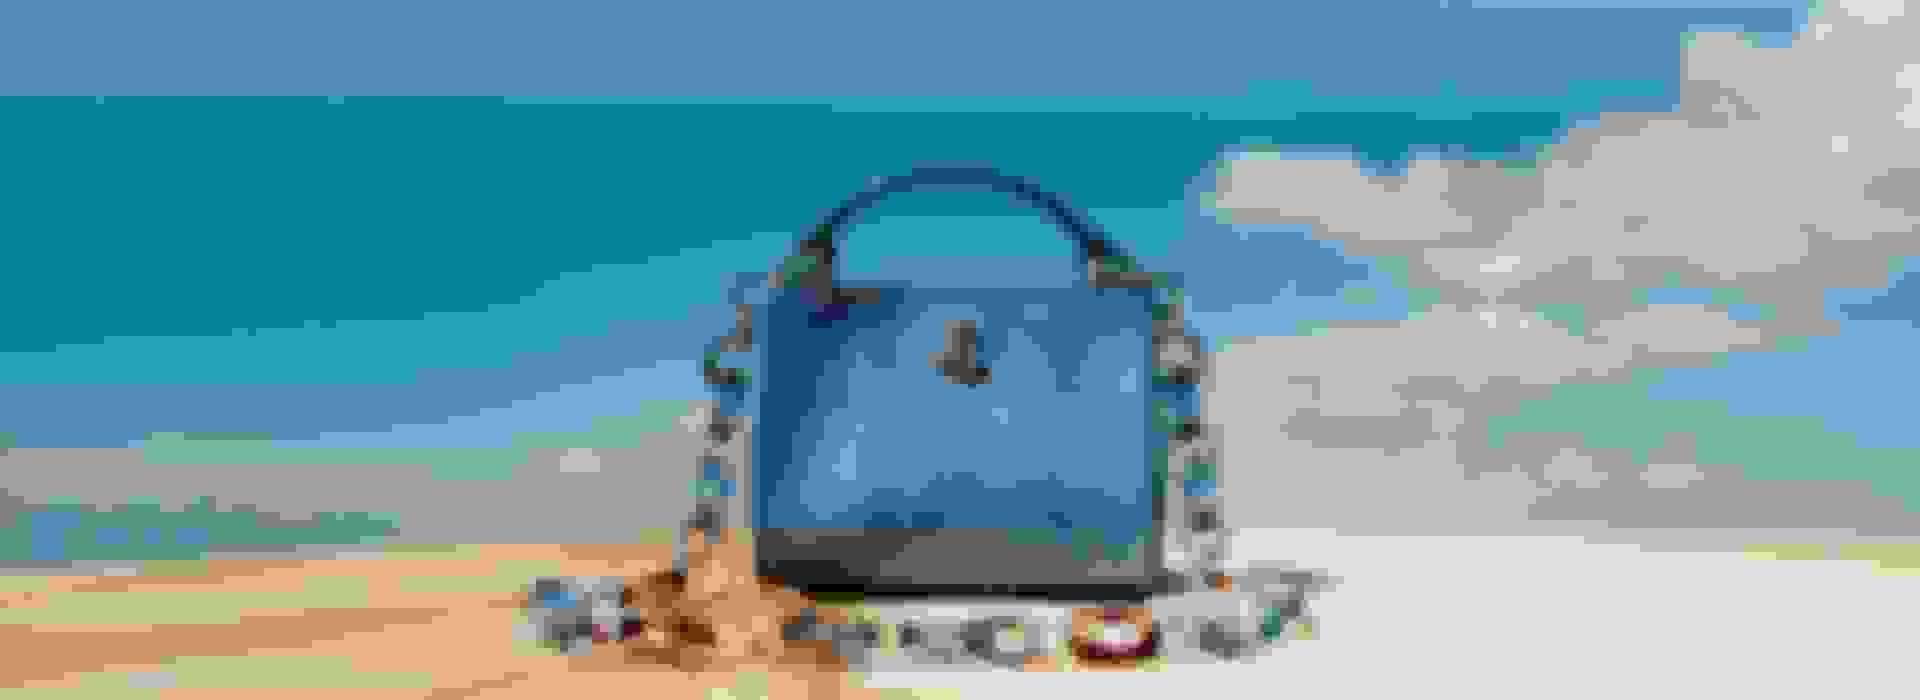 Jimmy Choo women's mini handbag in blue shade with tortoiseshell plexi chain